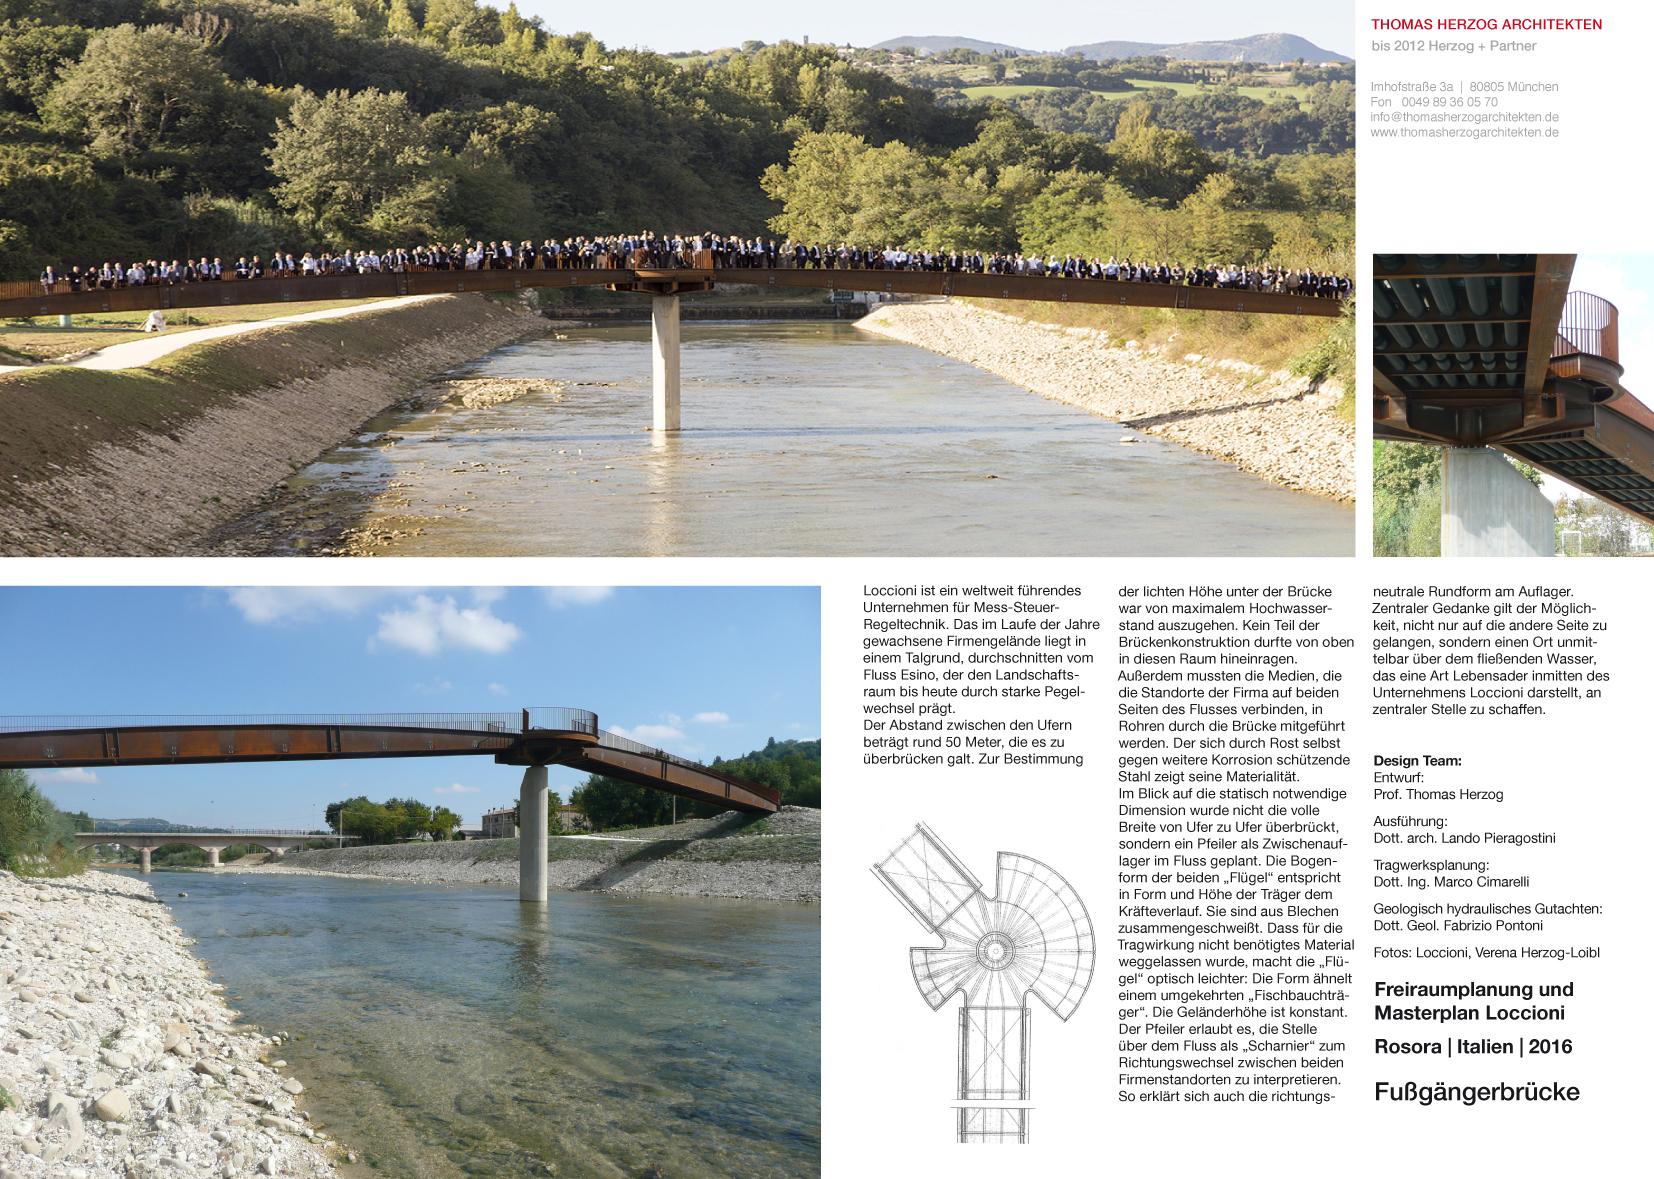 Fußgängerbrücke Rosora IT 2016 Freiraumplanung und Masterplan Loccioni